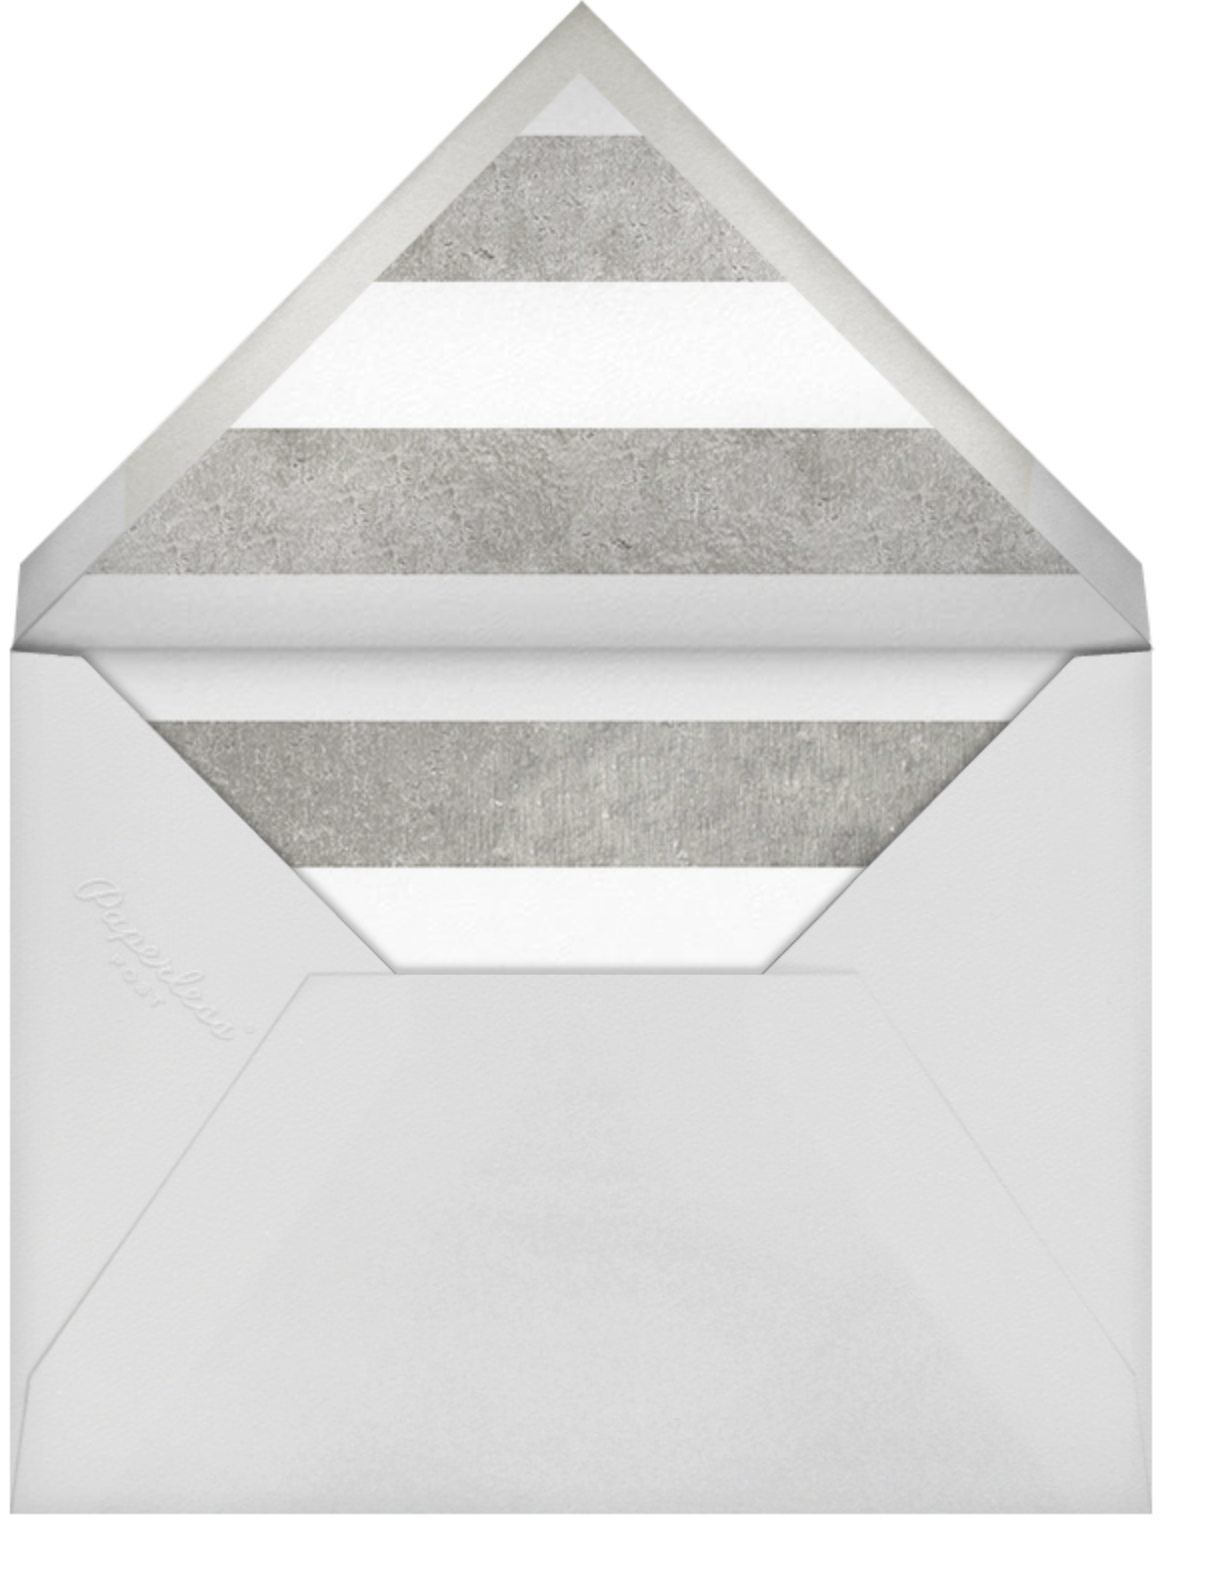 Stripe Suite (Stationery) - Silver - kate spade new york - General - envelope back